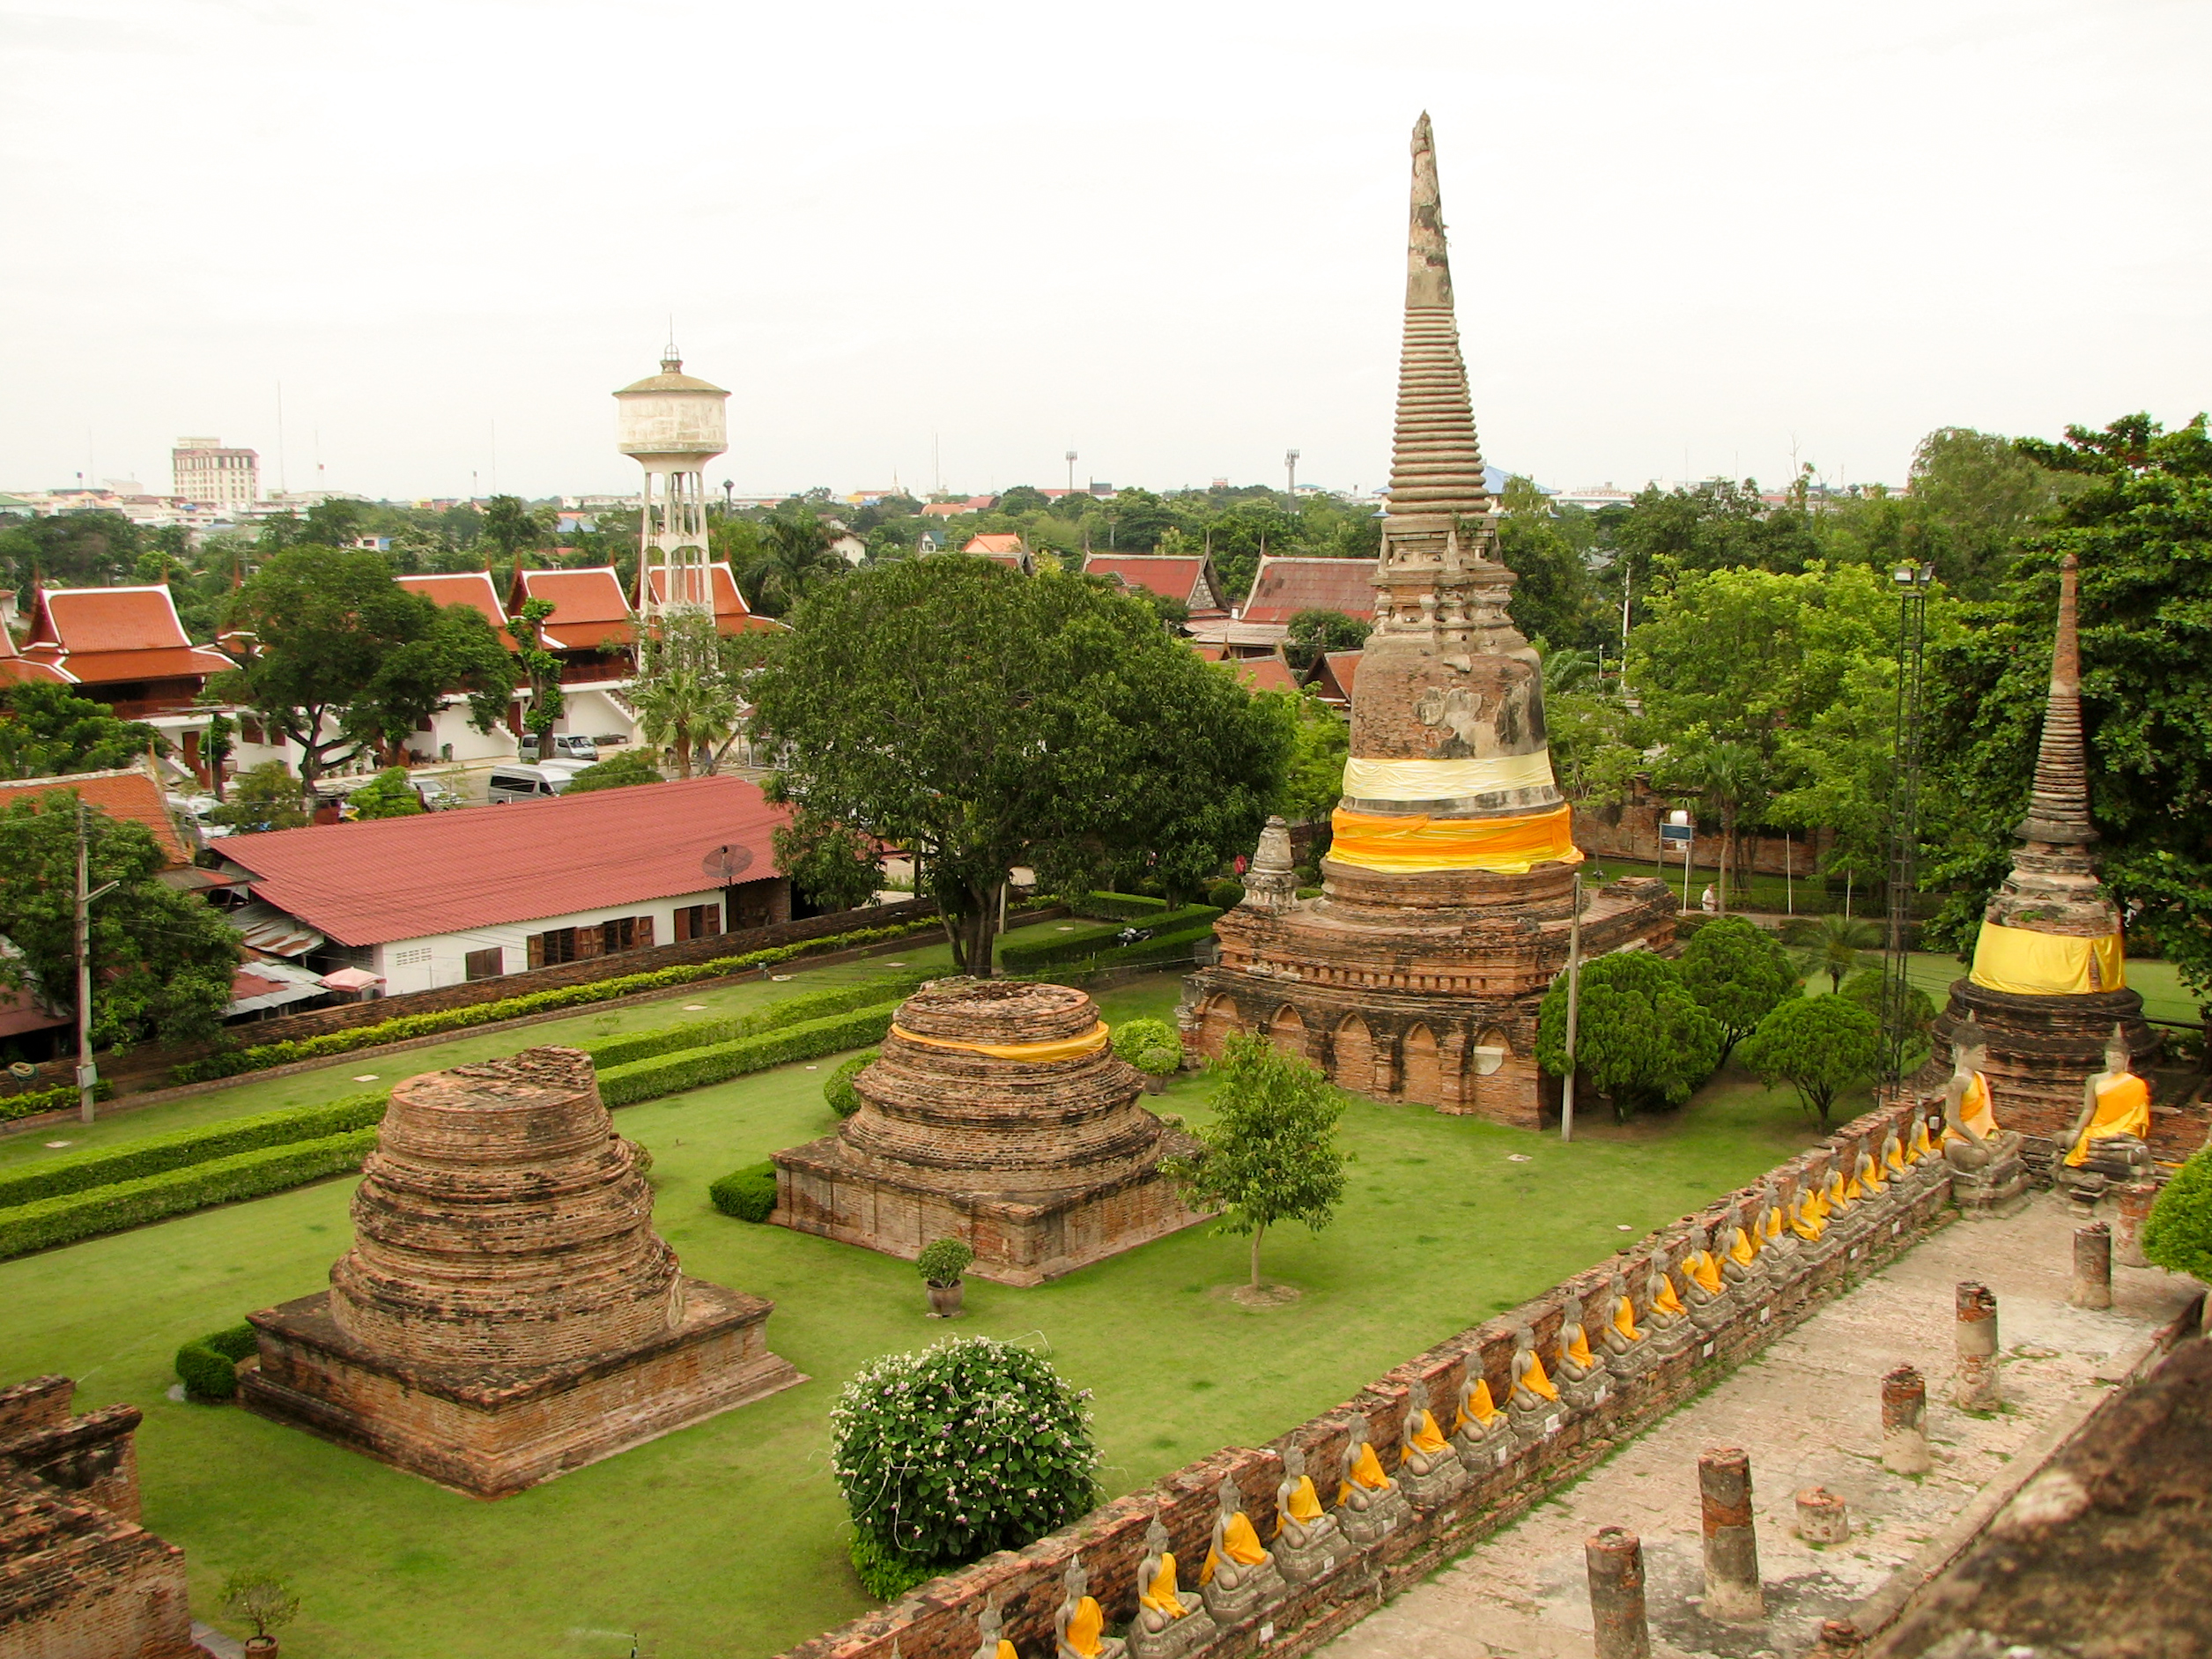 File:Wat Yai Chai Mongkhon Ayutthaya Thailand 10.jpg - Wikimedia Commons